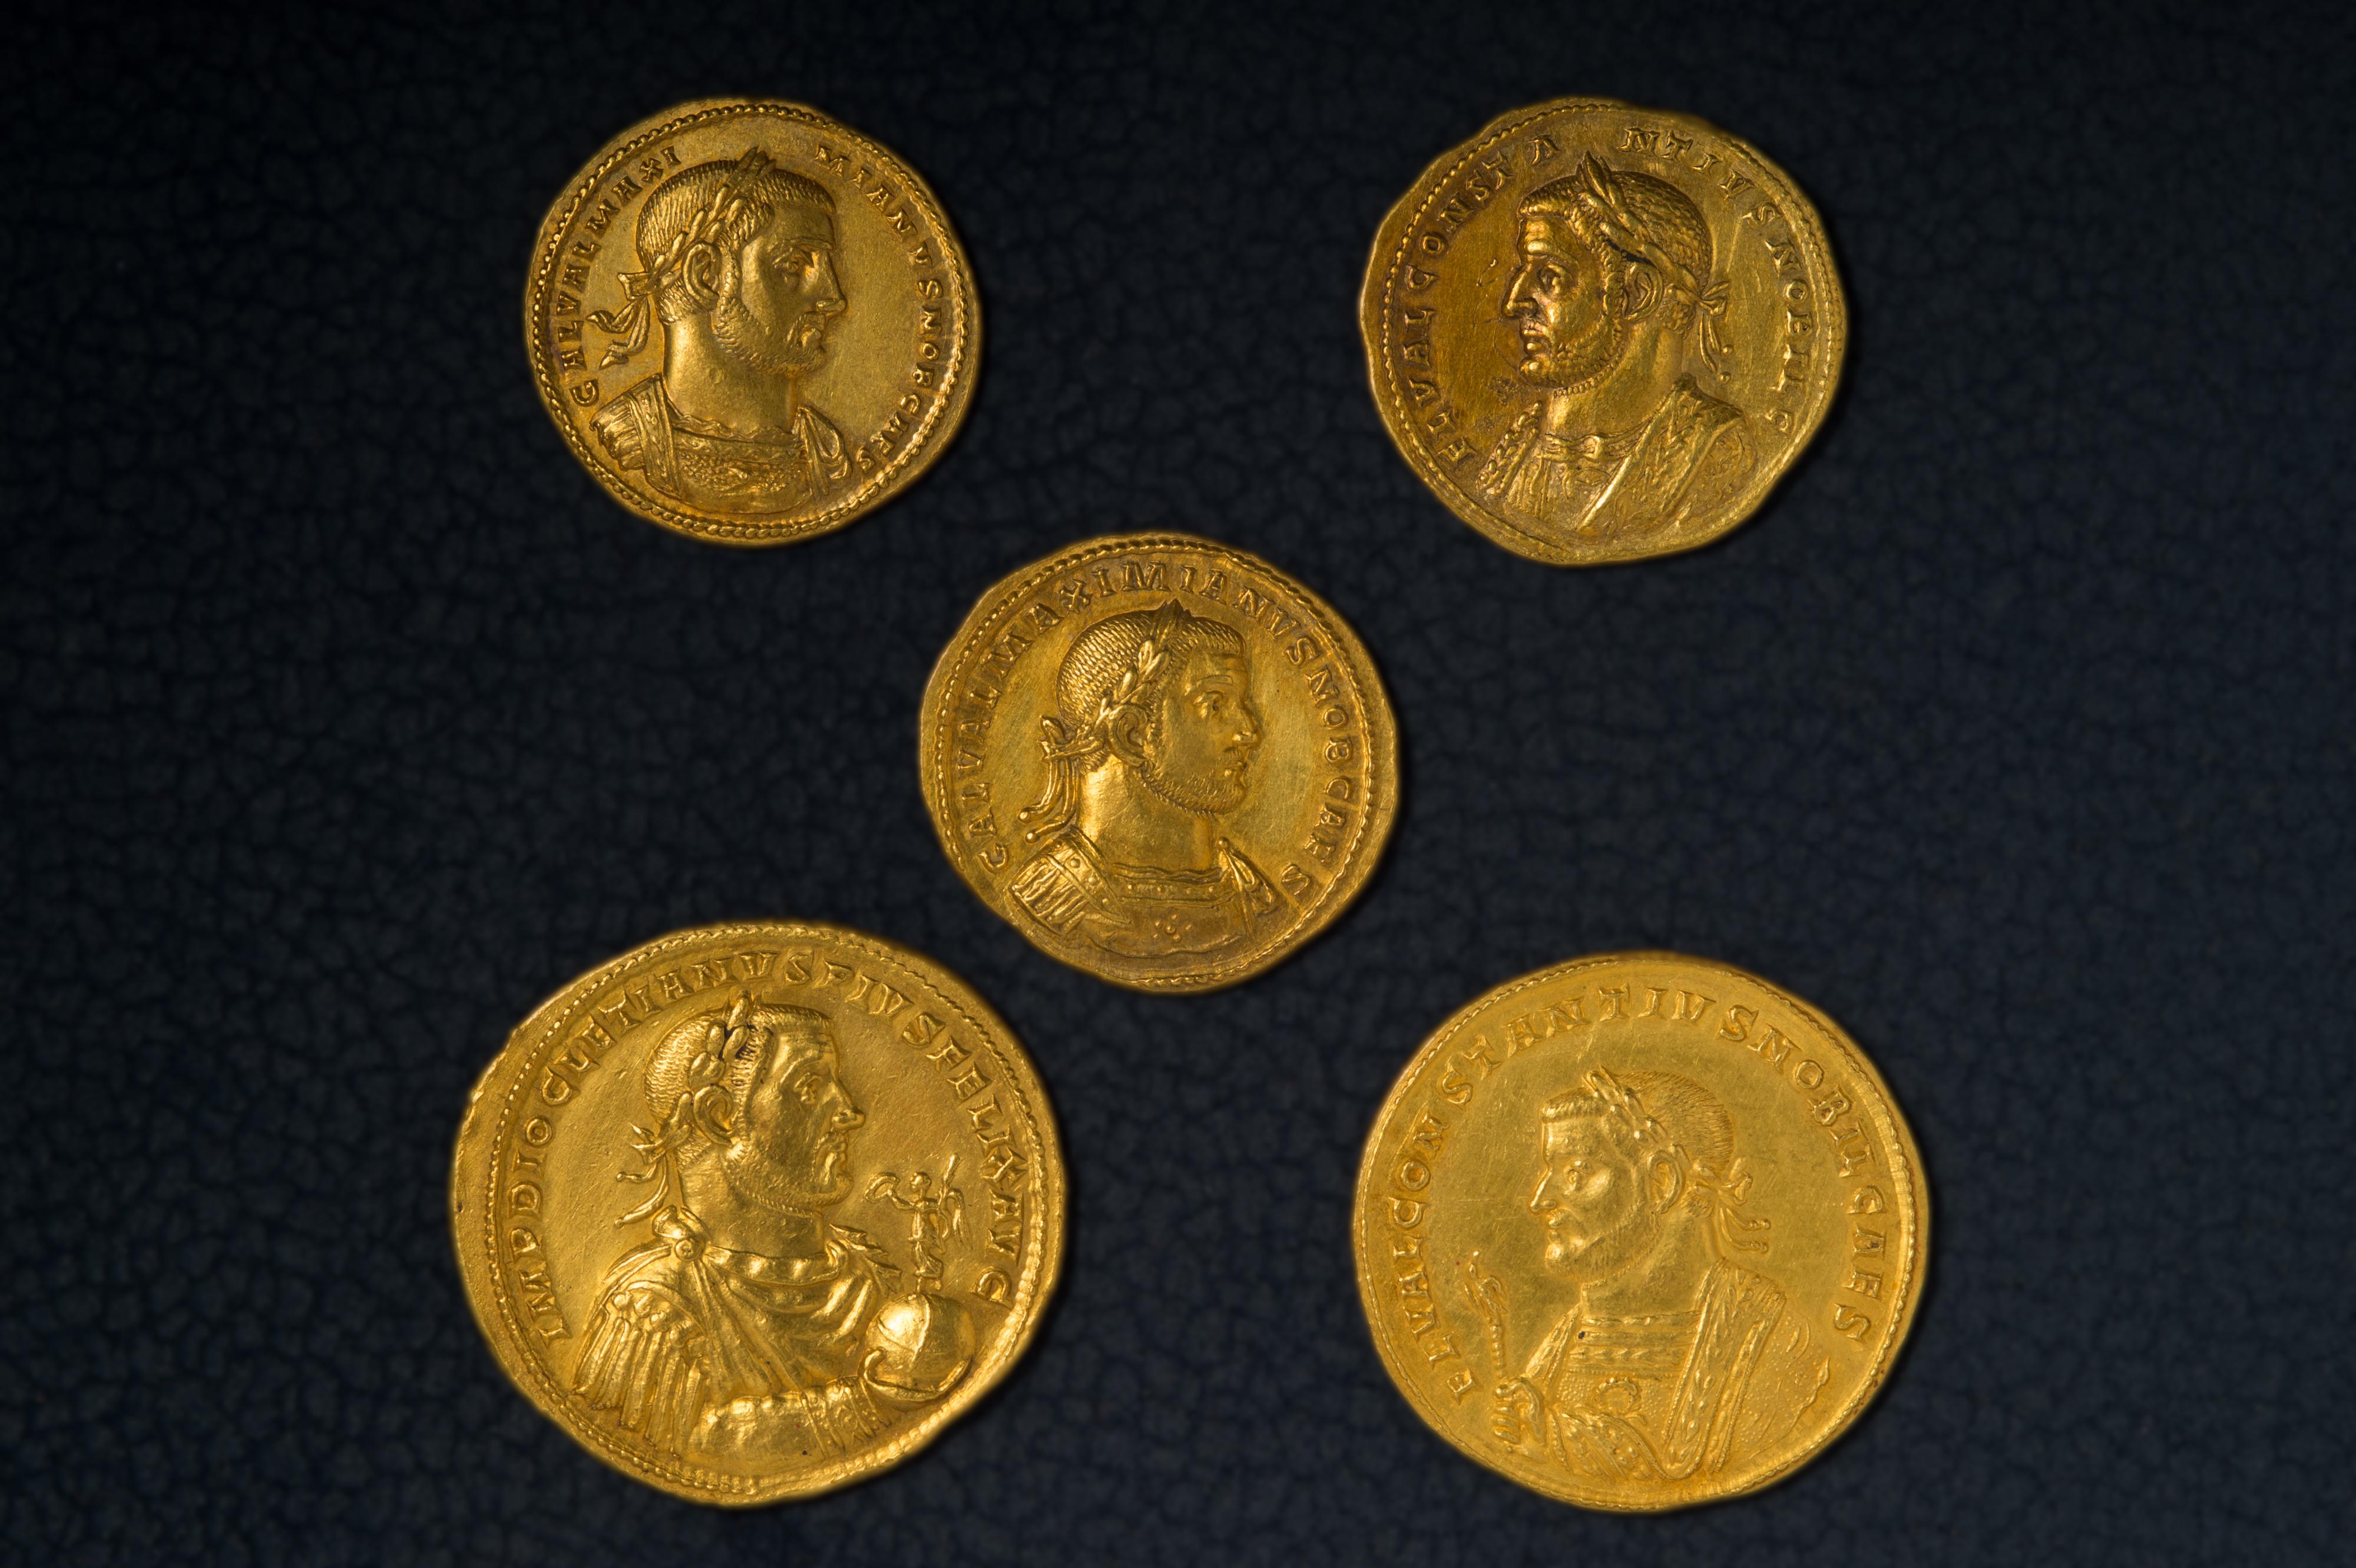 Un merveilleux trésor romain